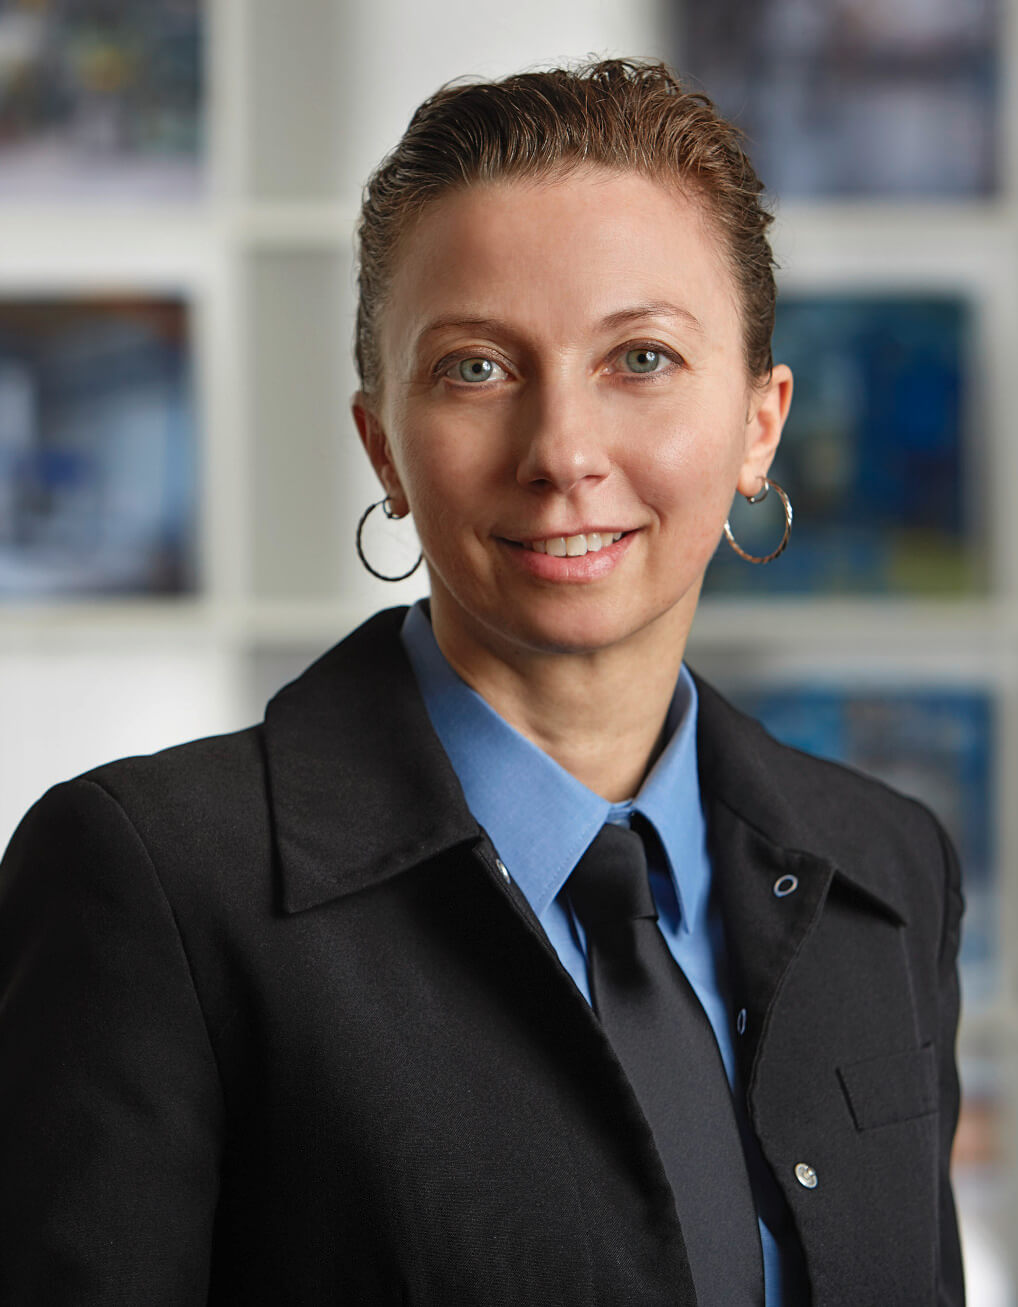 Insolvenzverwalterin Frankfurt am Main Katja Dönges